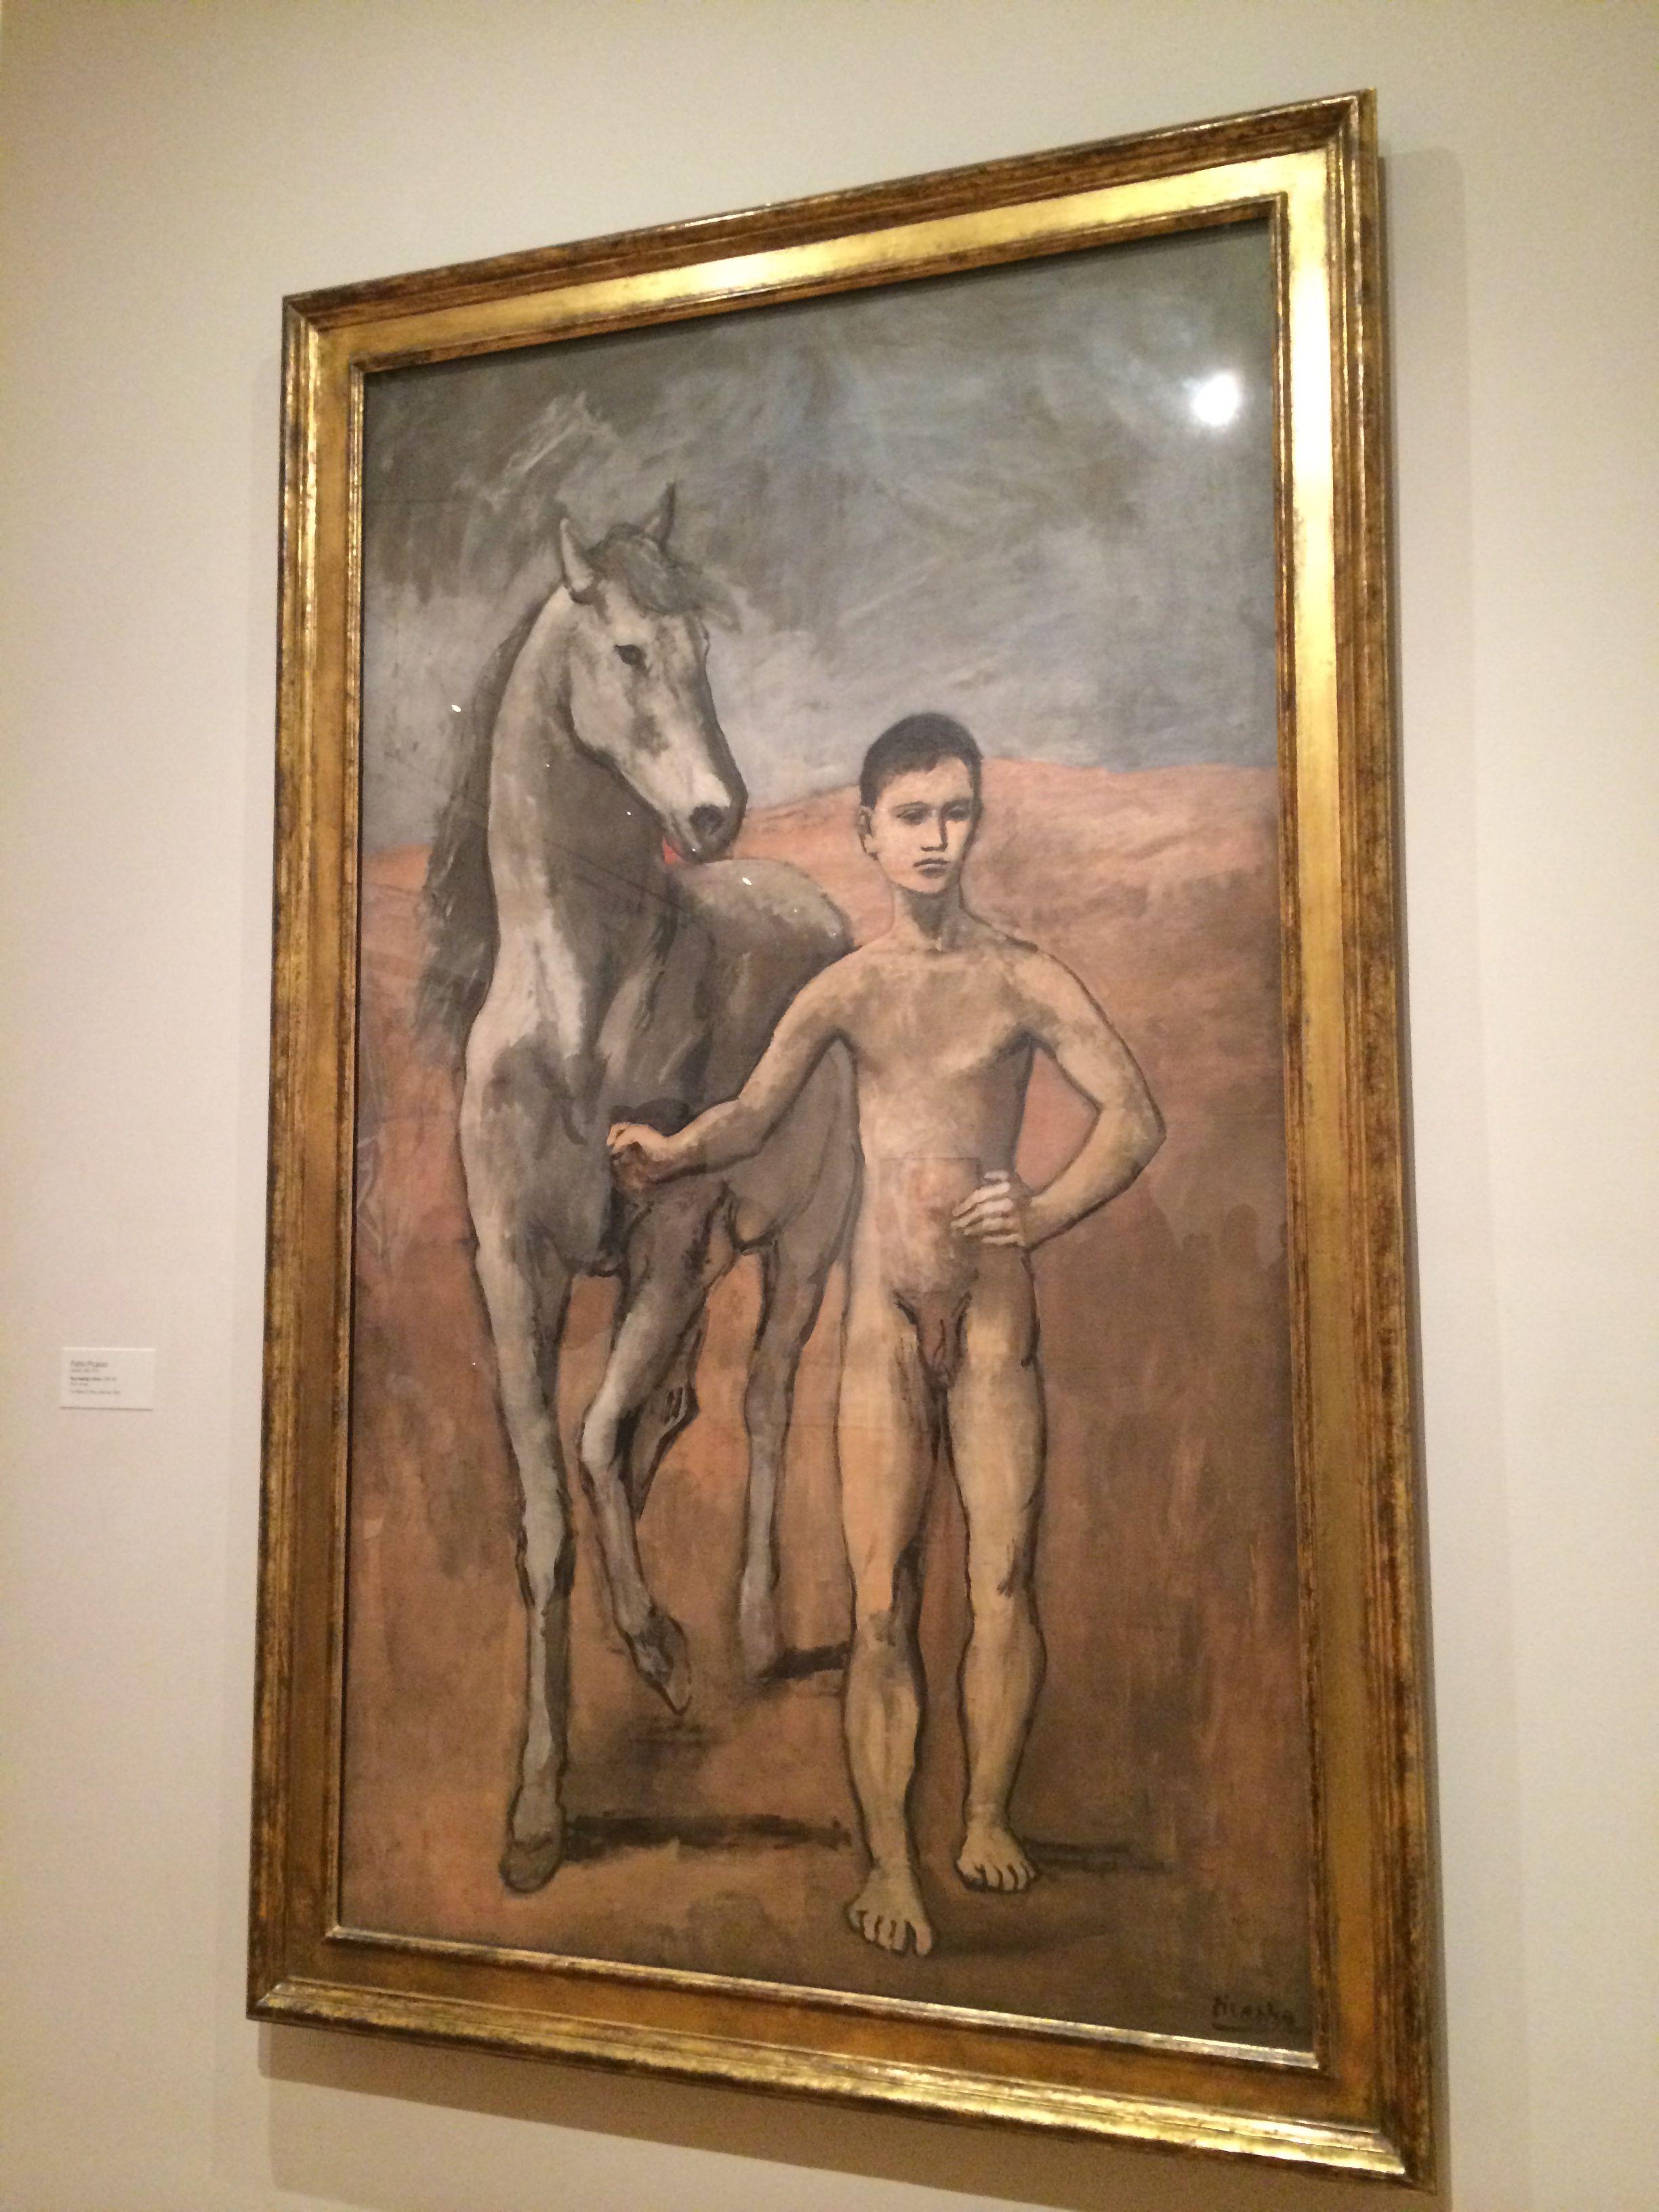 Pablo Picasso's boy leading a horse